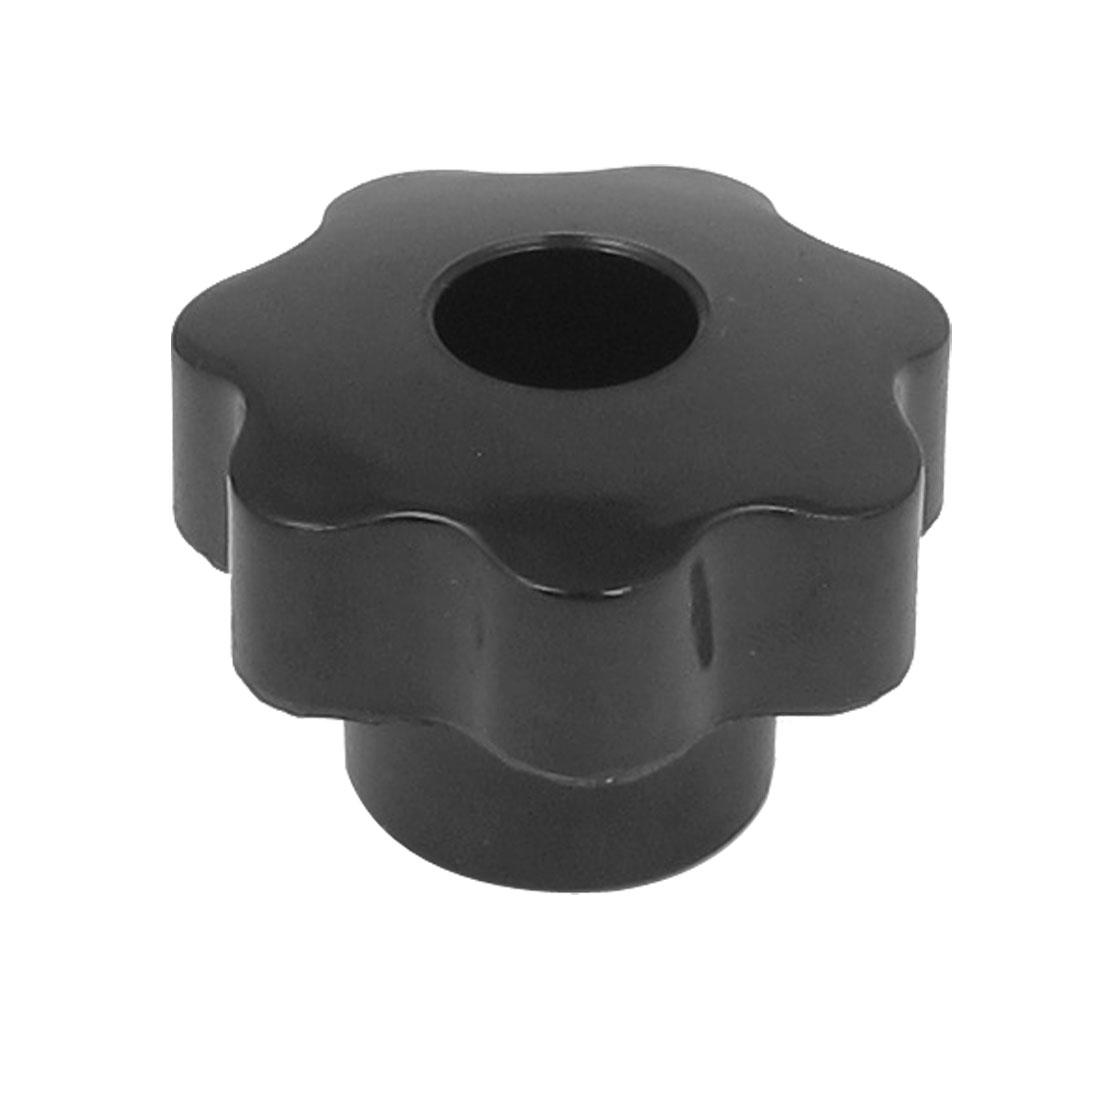 7mm Female Threaded Diameter Plastic Head Screw on Type Clamping Knob Grip